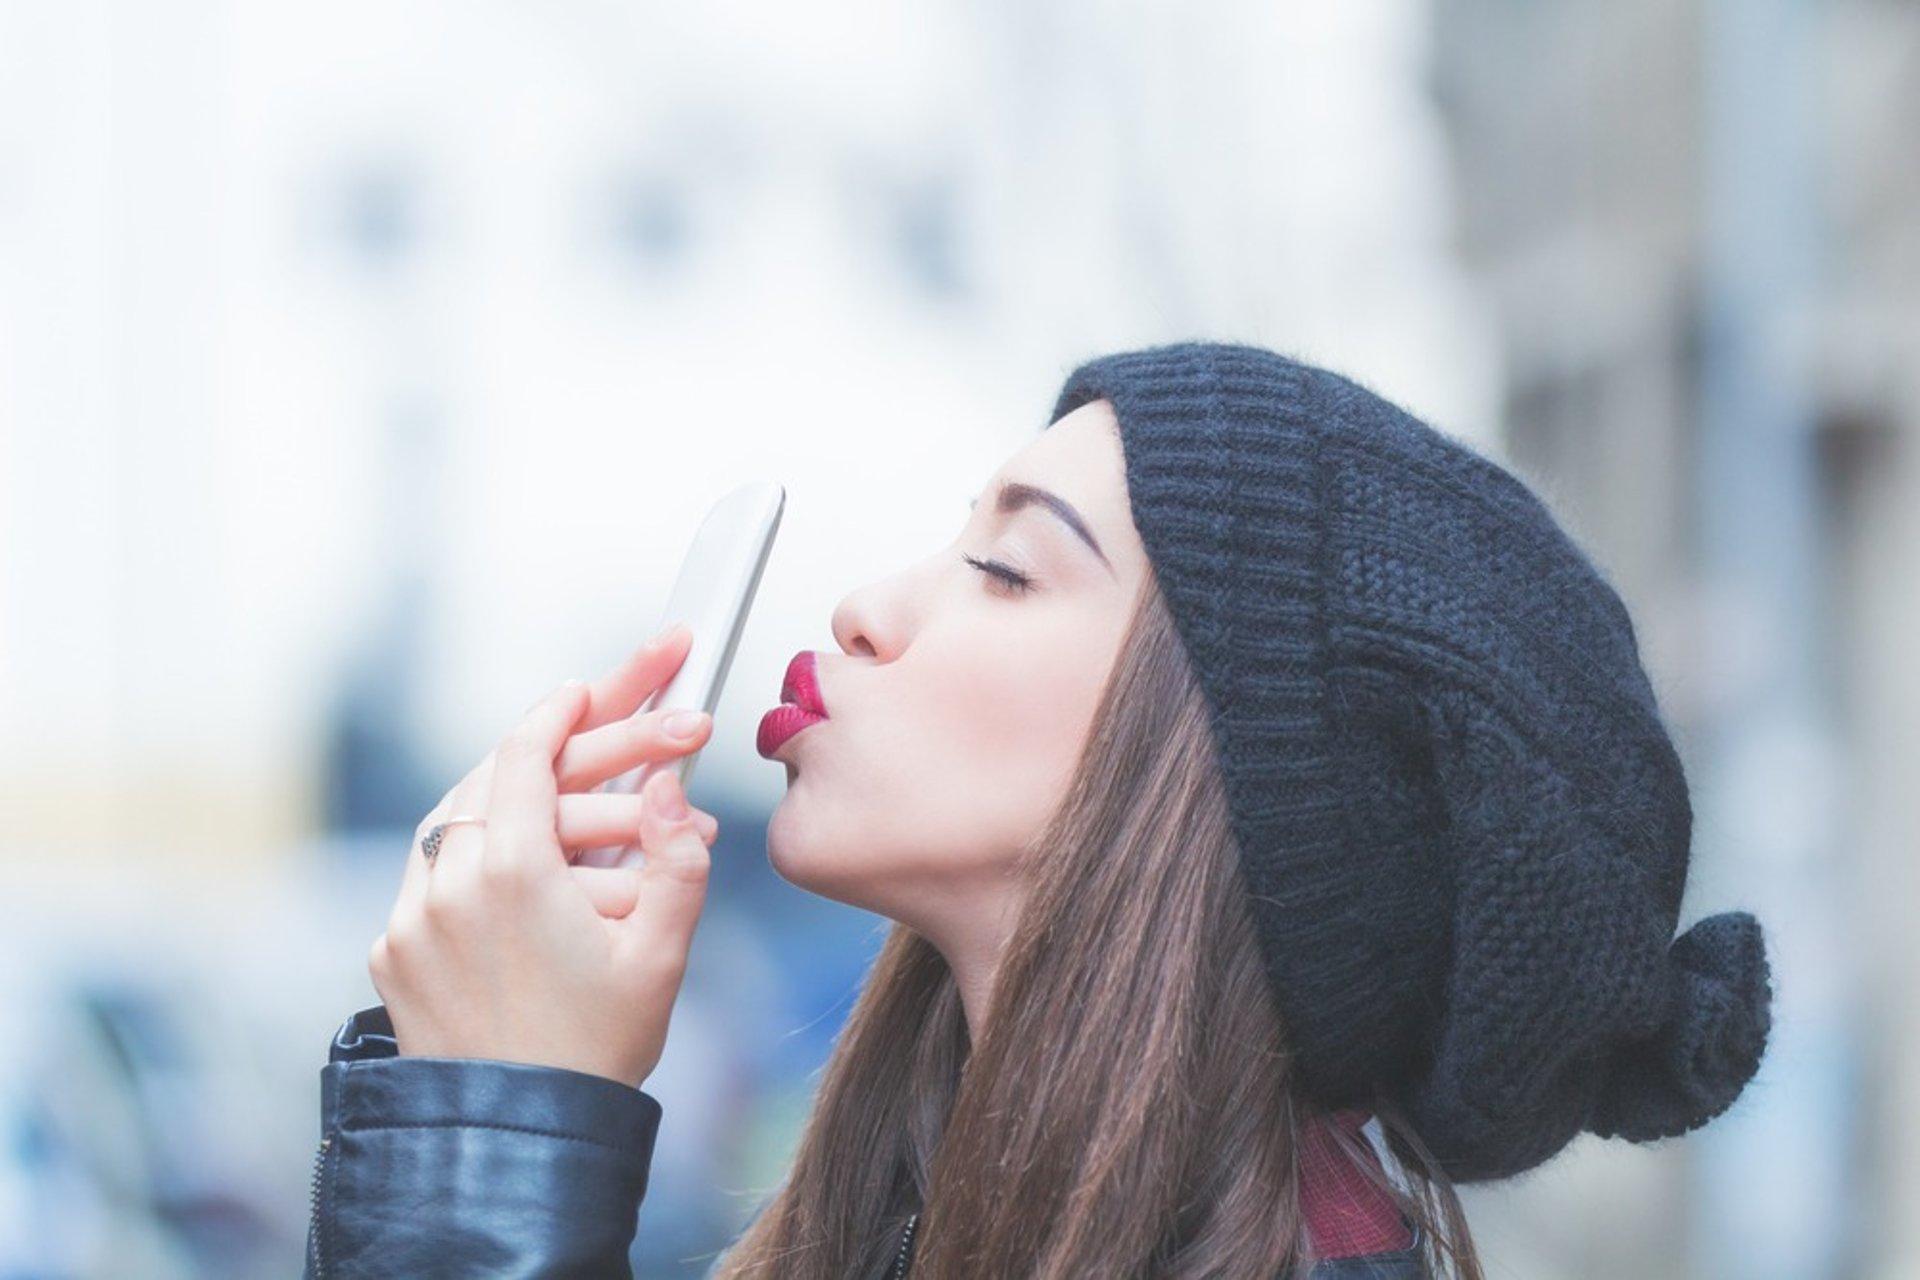 Woman Kissing Phone